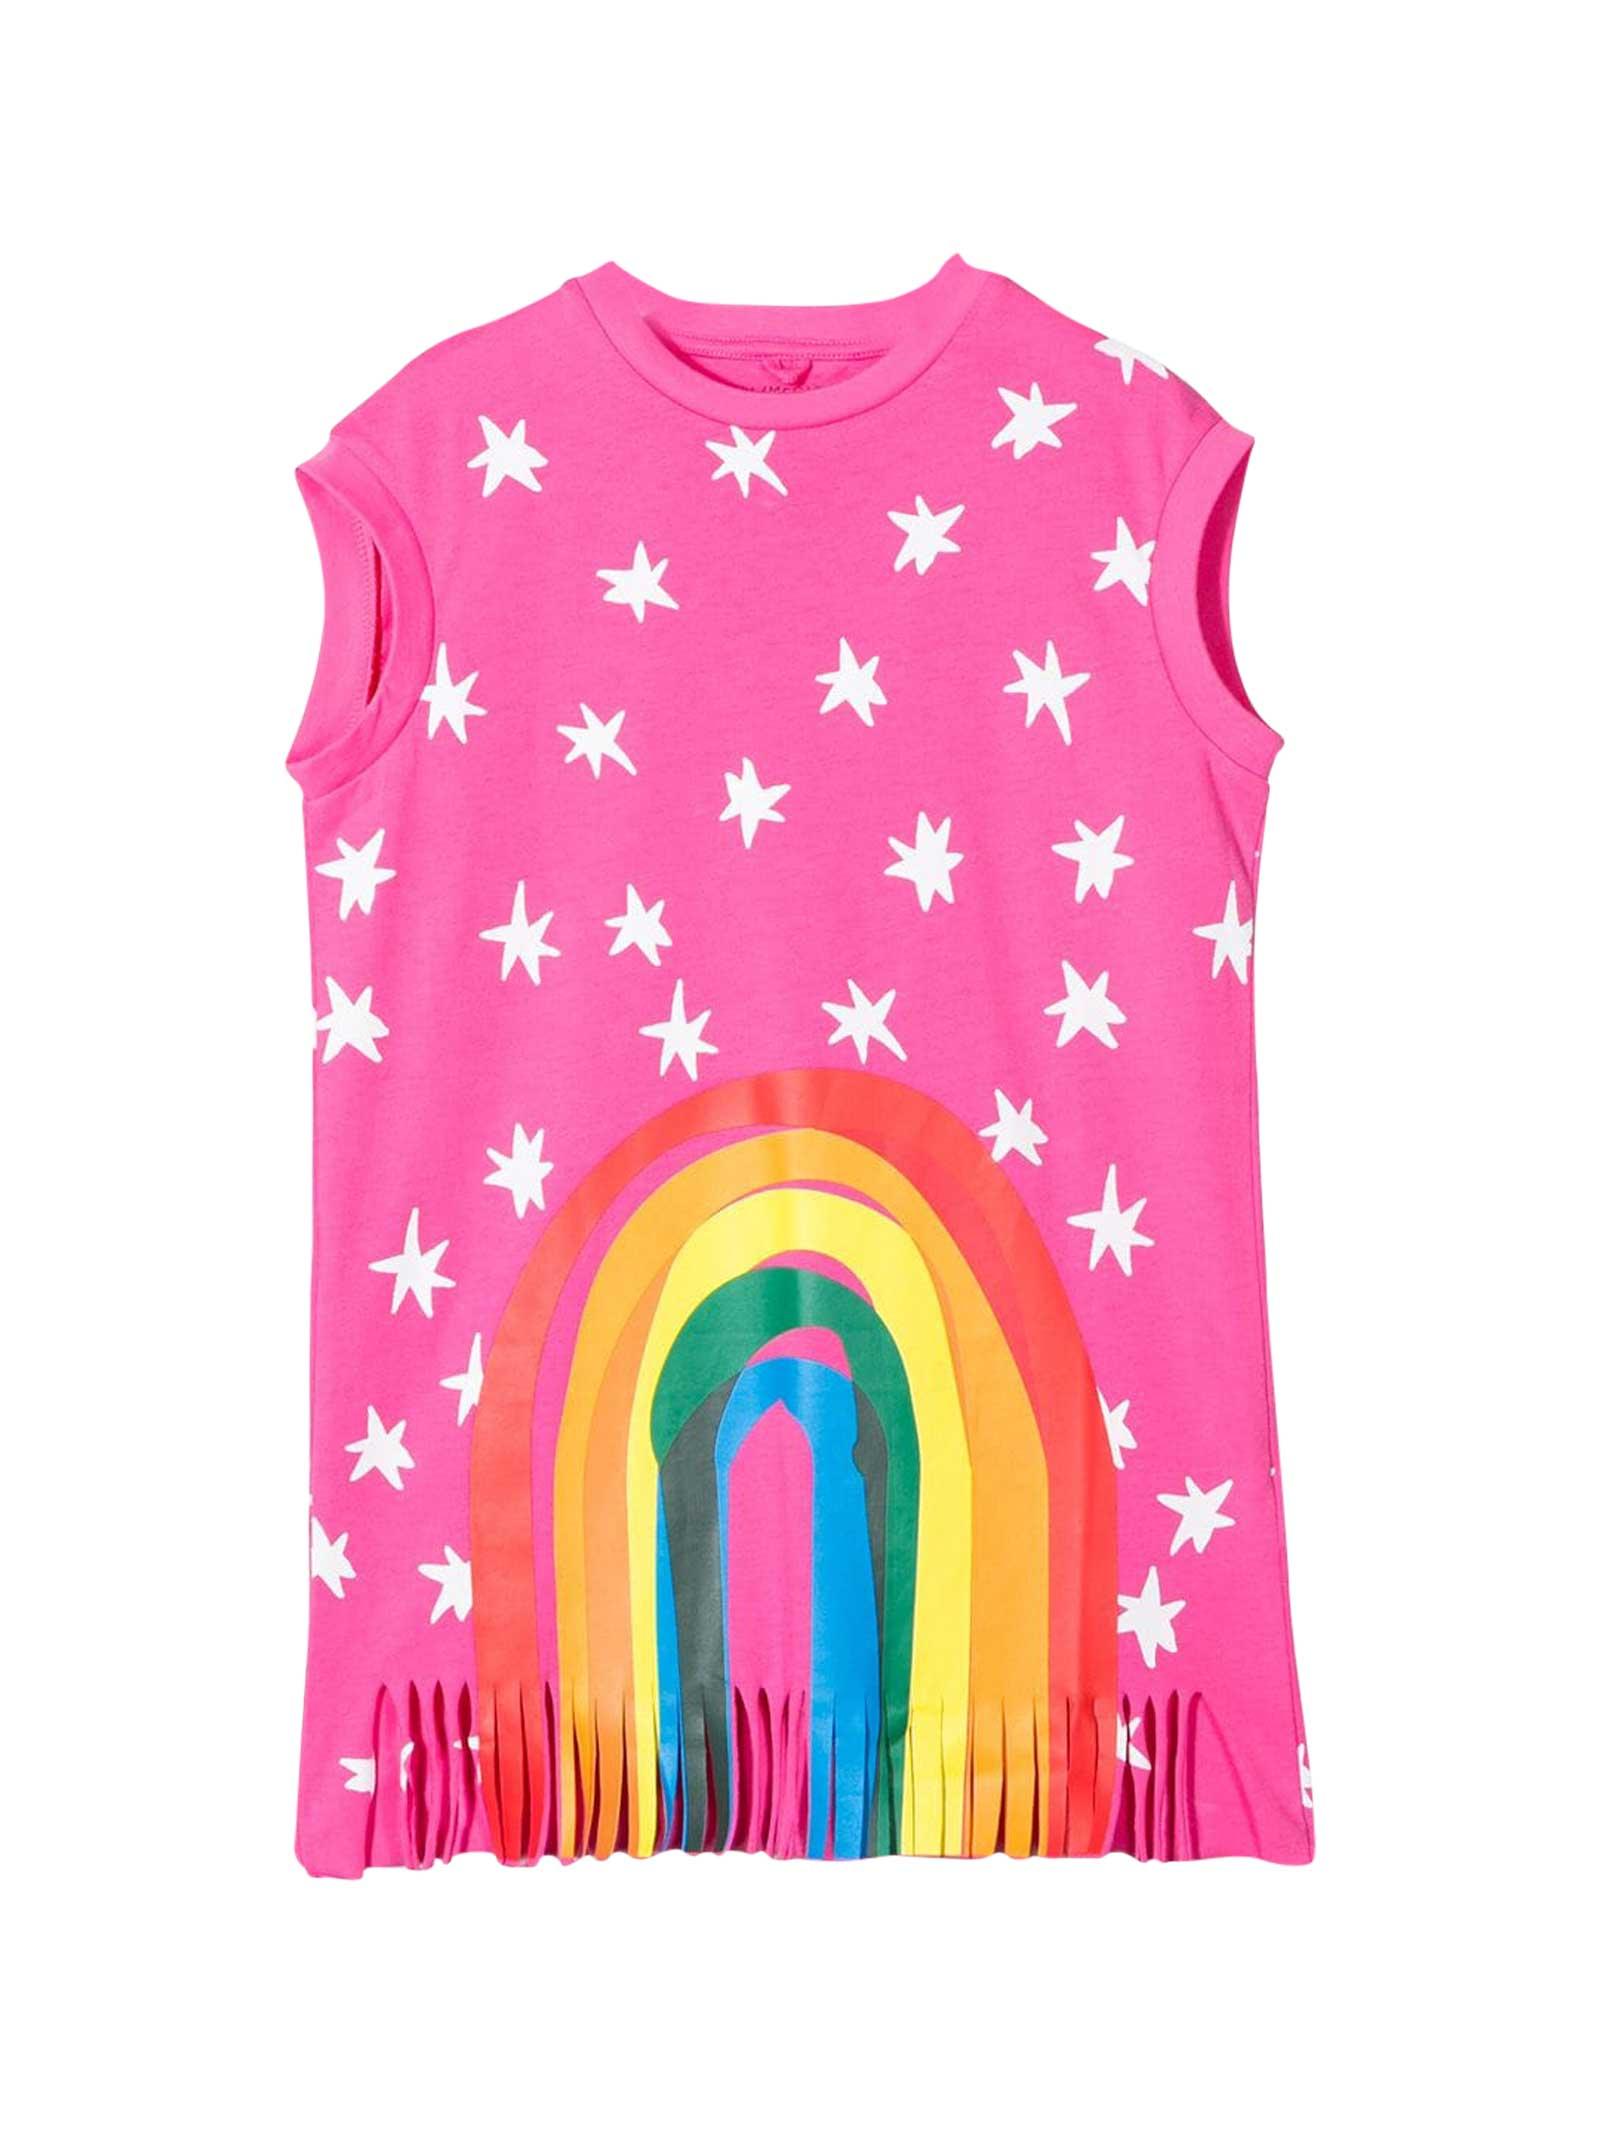 Buy Stella McCartney Kids Pink Dress With Multicolor Press online, shop Stella McCartney Kids with free shipping